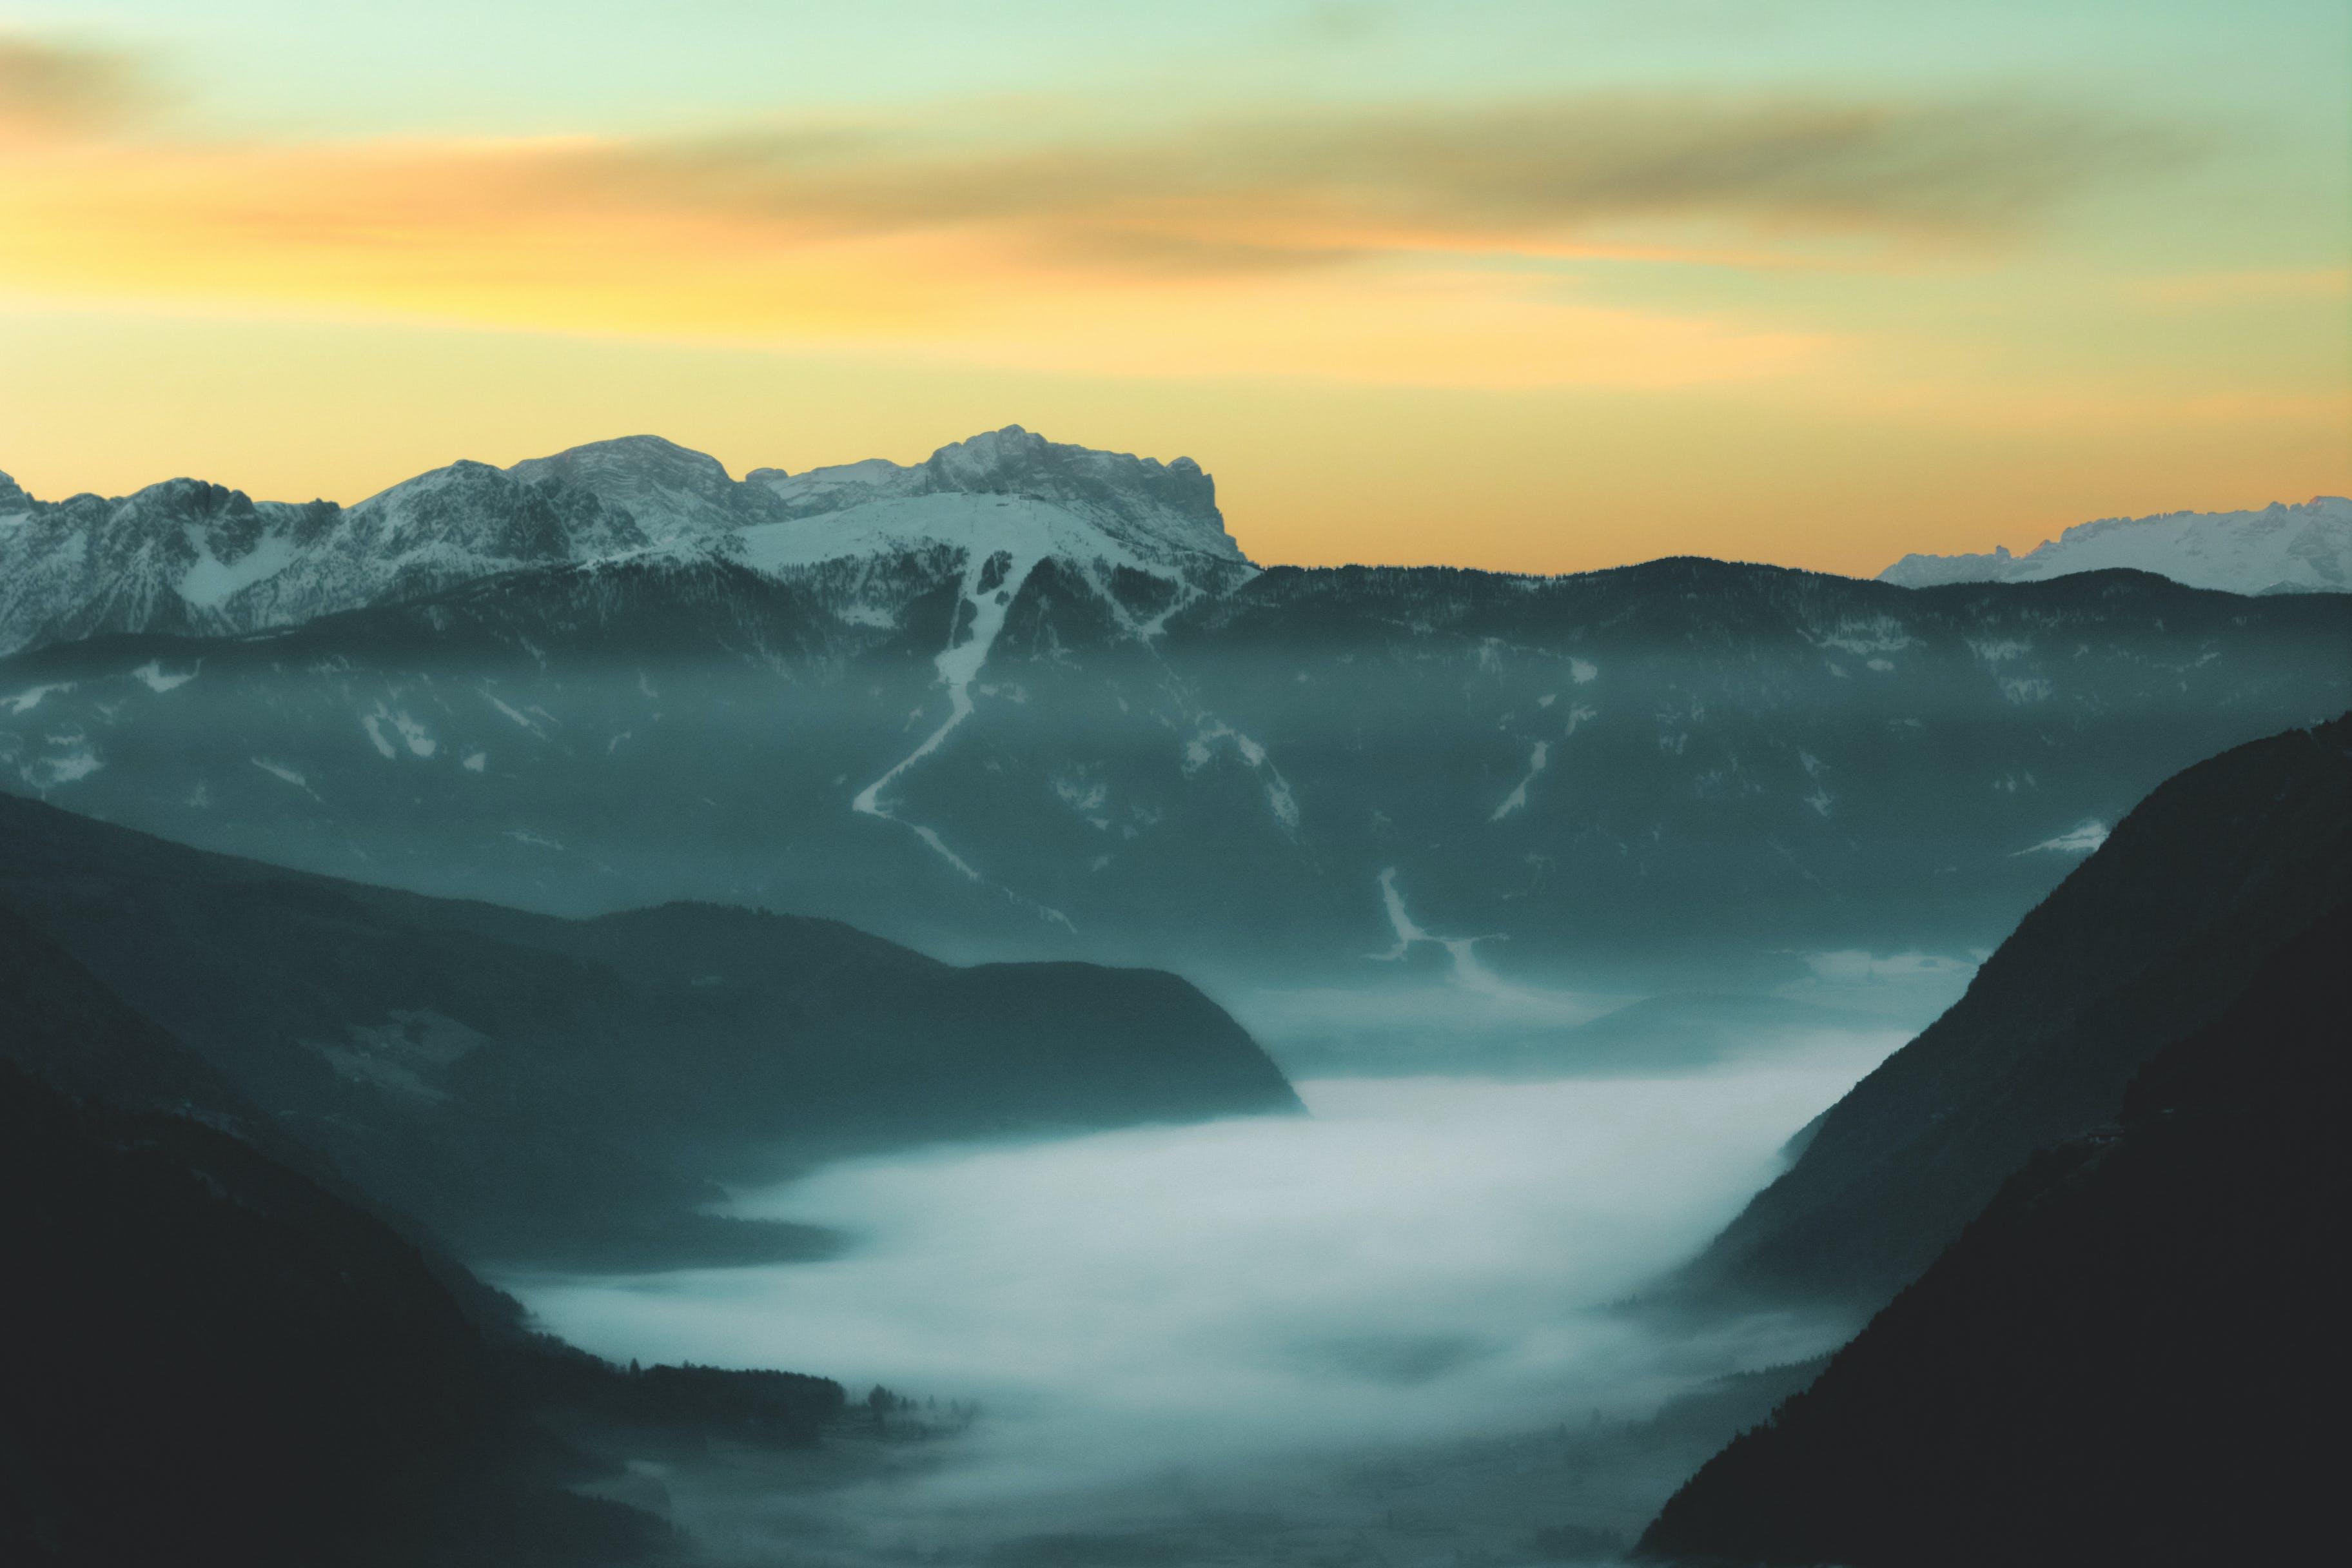 Fog on Mountain during Dusk